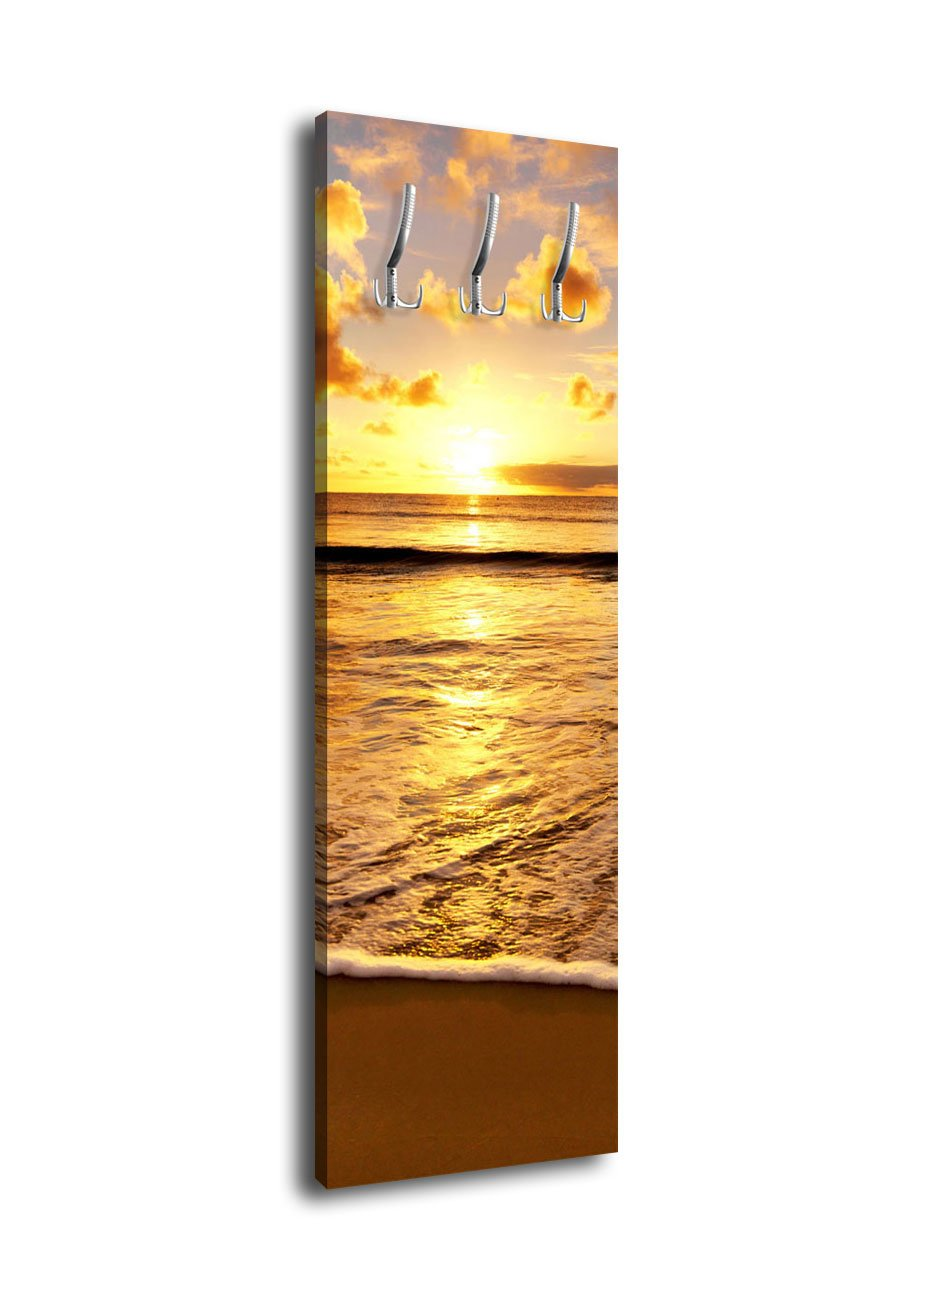 Wandmotiv24 Garderobe mit Design Sonnenuntergang G302 40x125cm Wandgarderobe Strand Ufer Sonne